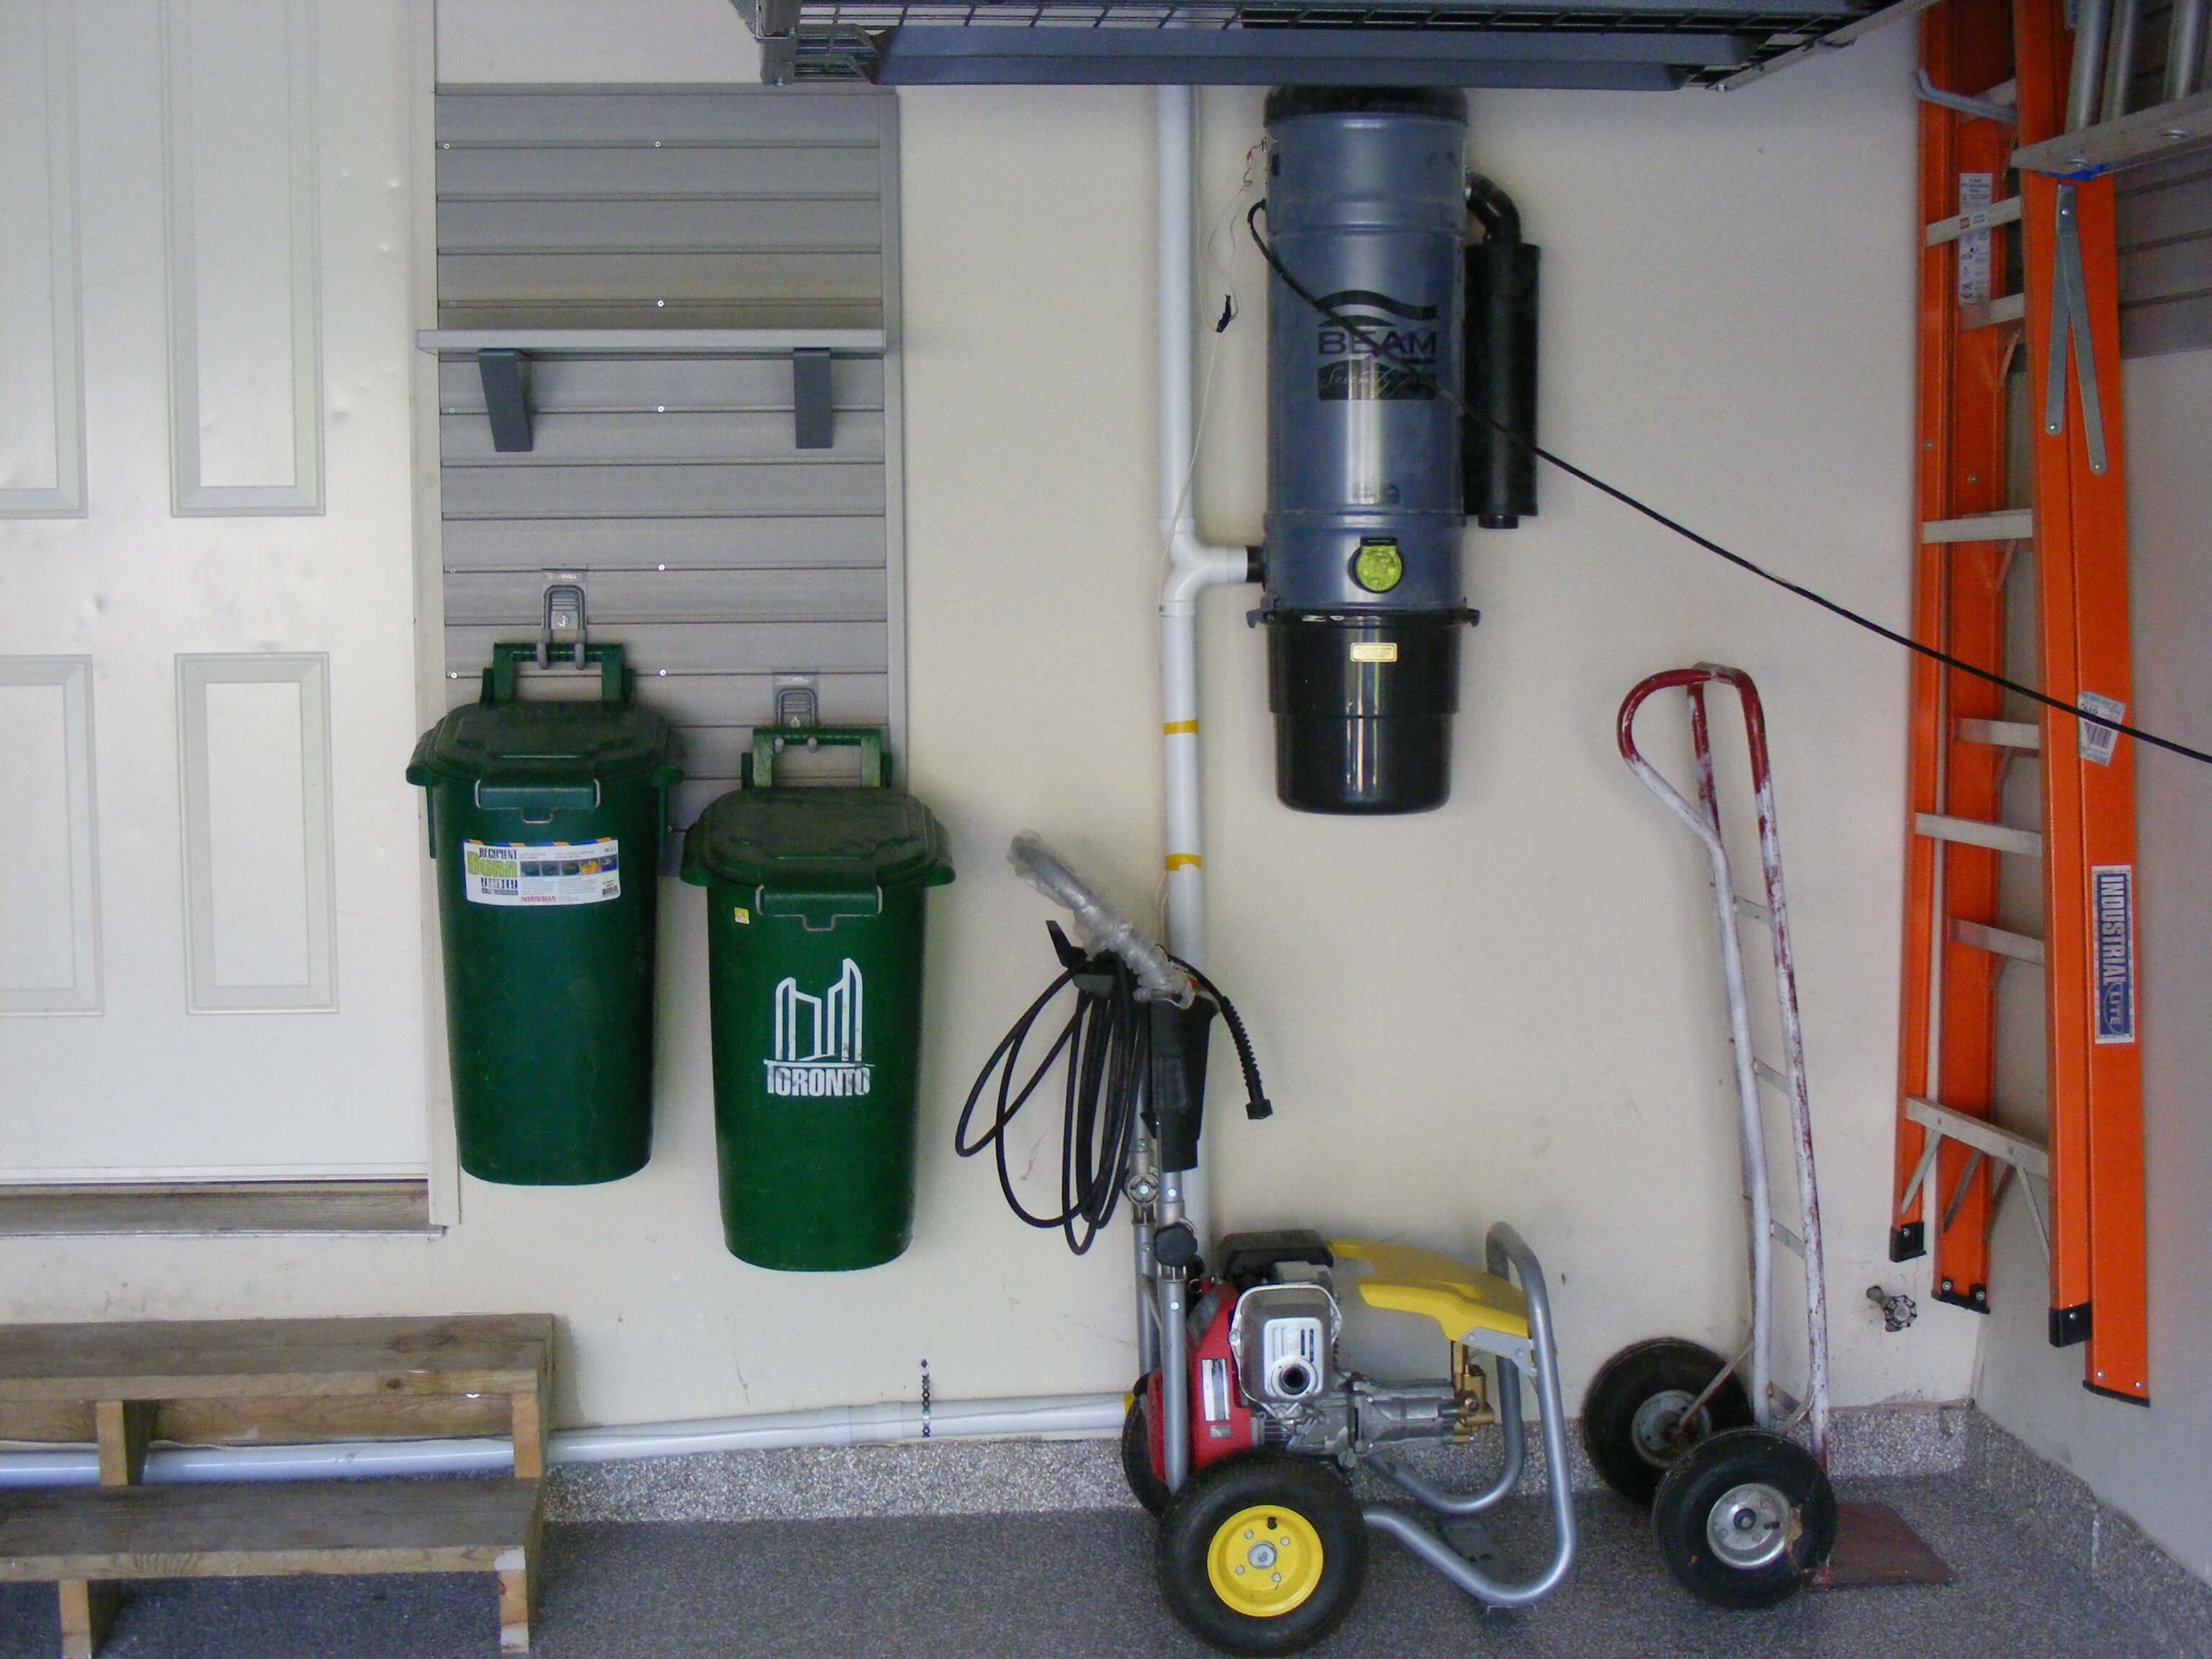 recycle bin ideas garage - Recycling and Garbage Bin Storage — Nuvo Garage